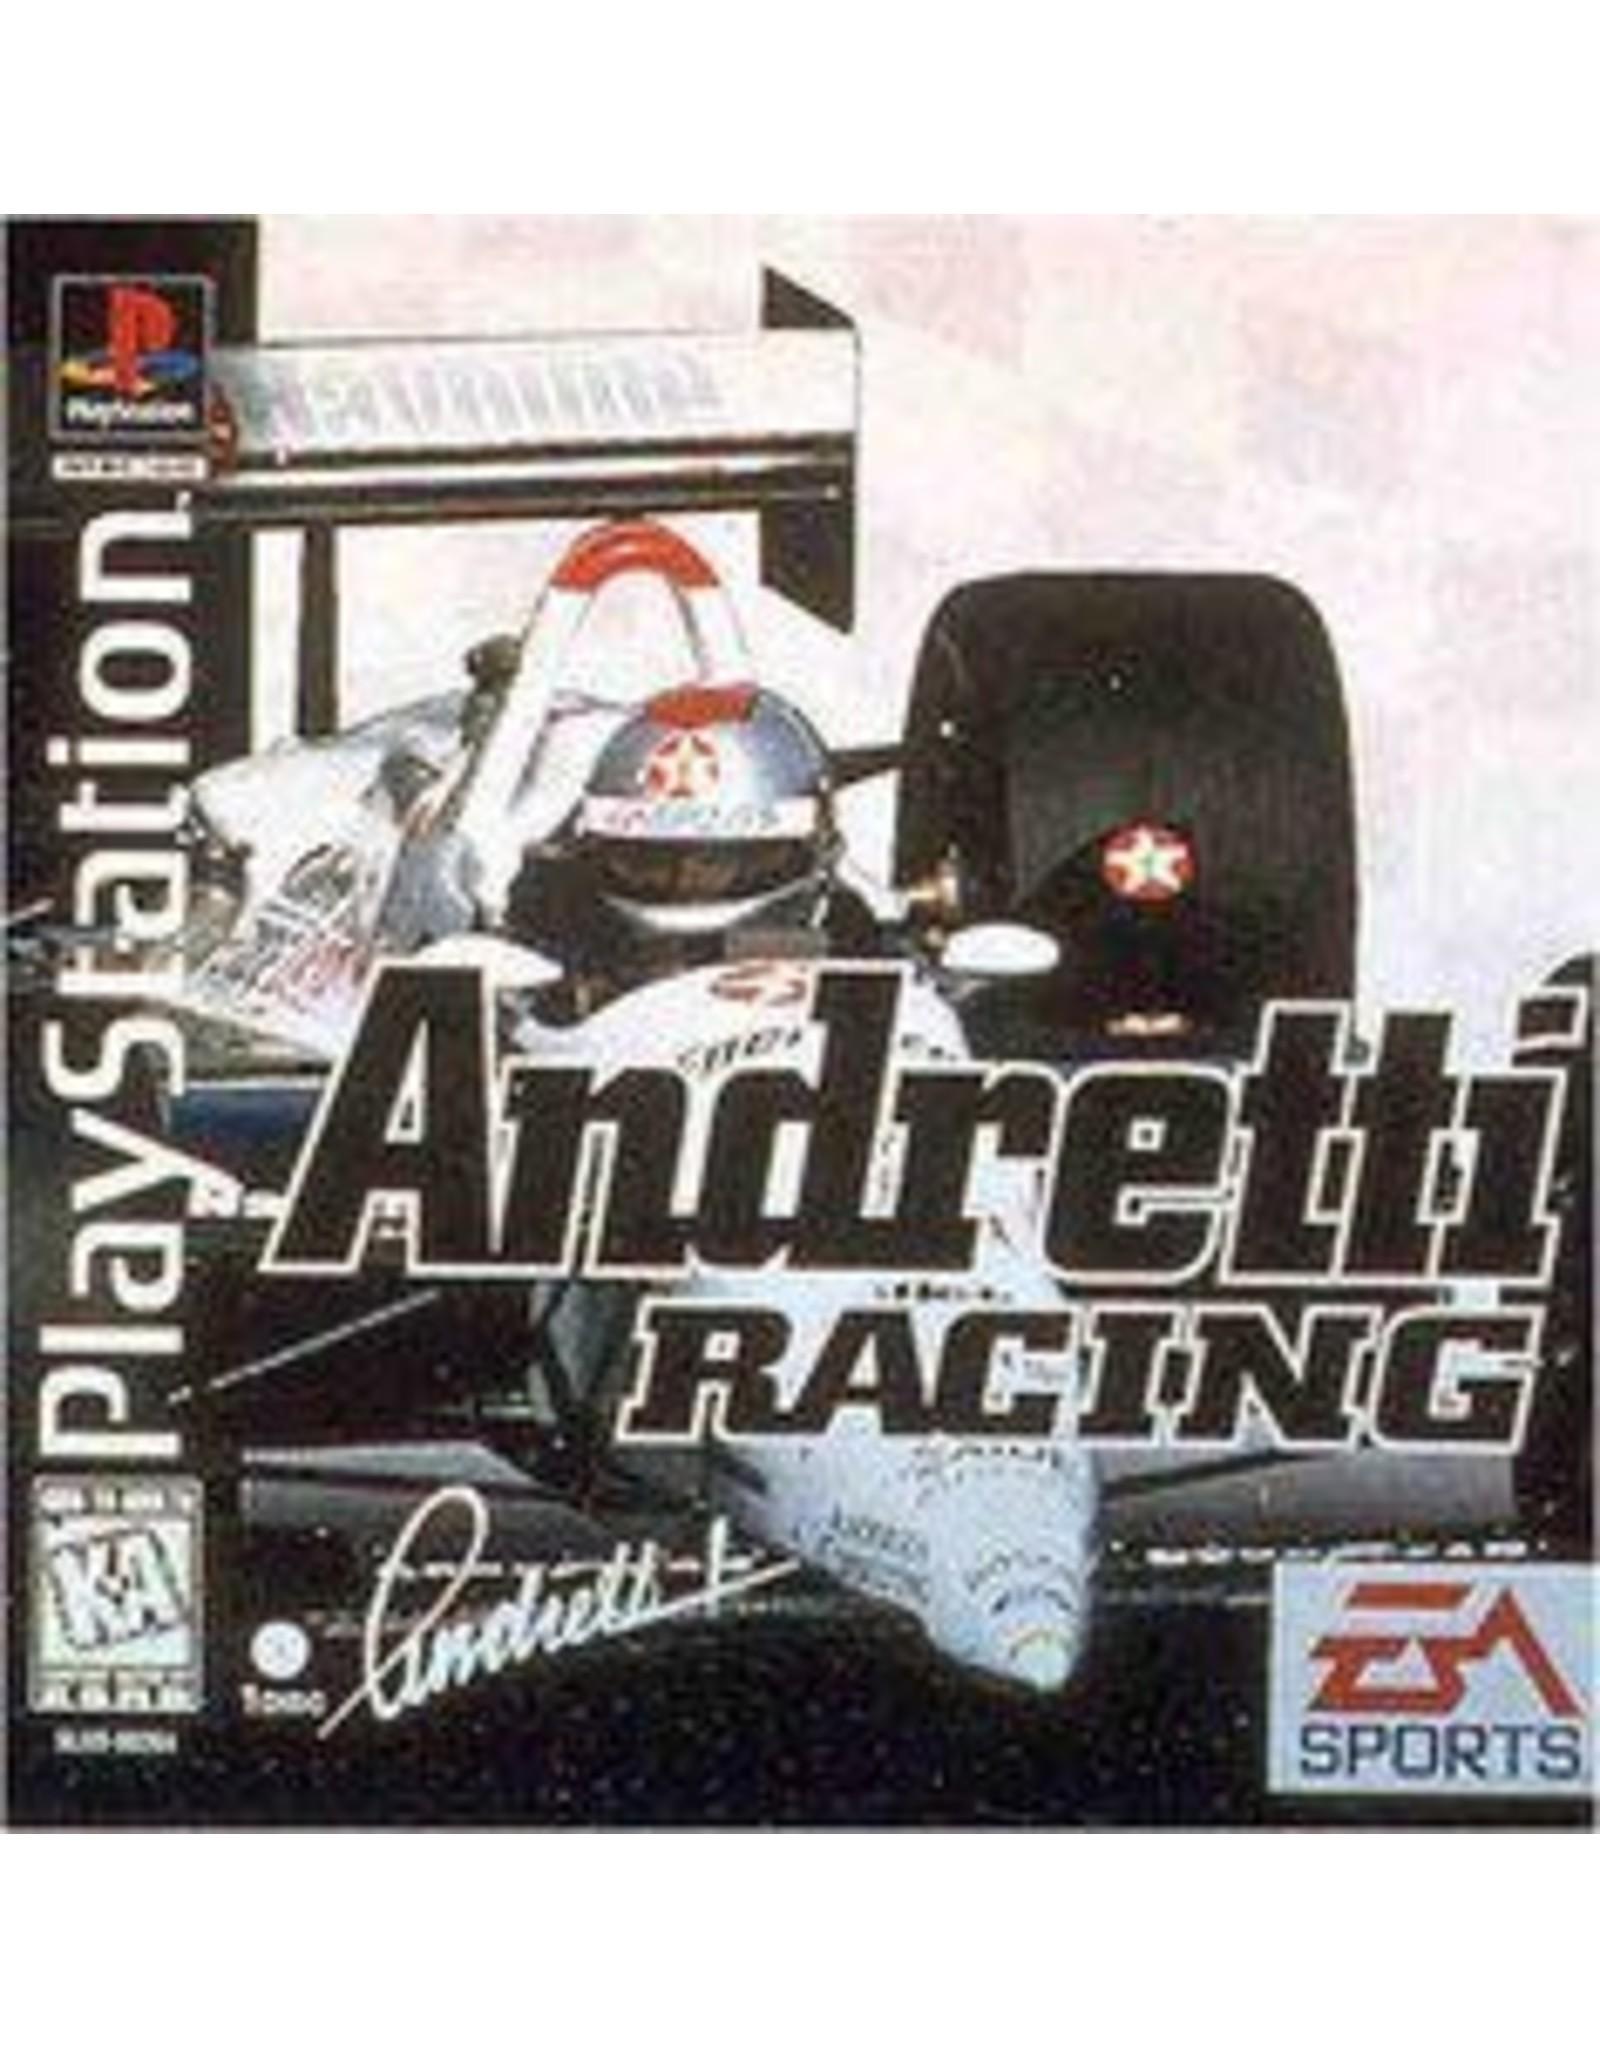 Playstation Andretti Racing (CiB)